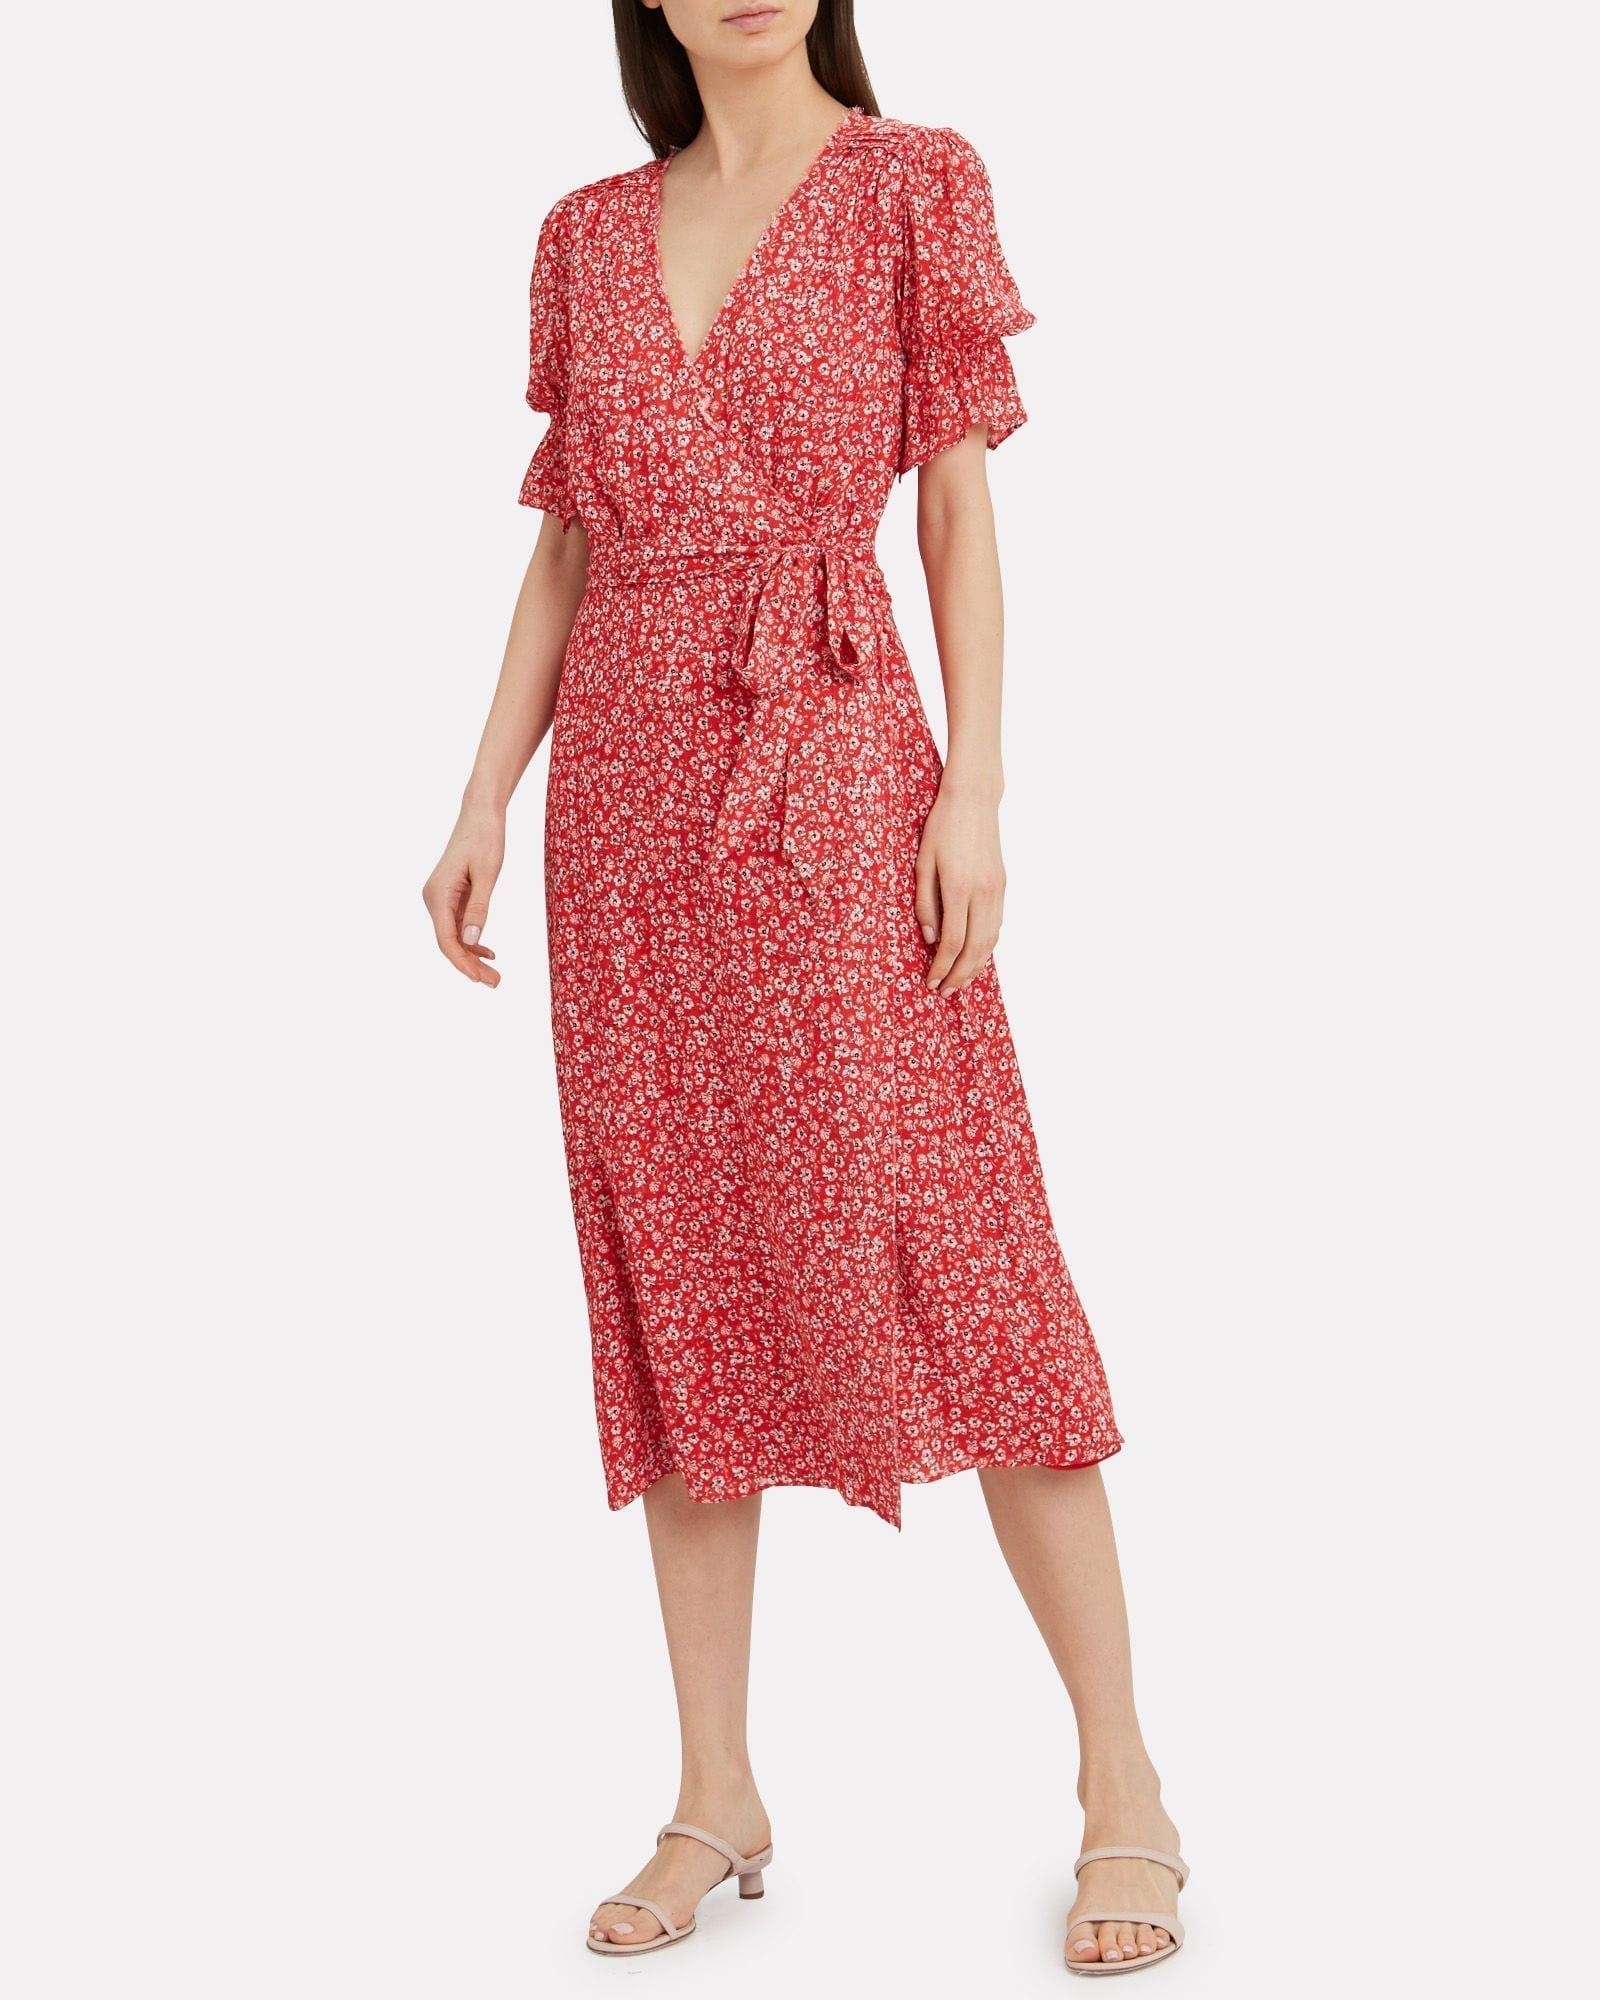 e08bfc26b652 STEVIE MAY Claret Midi Dress - We Select Dresses